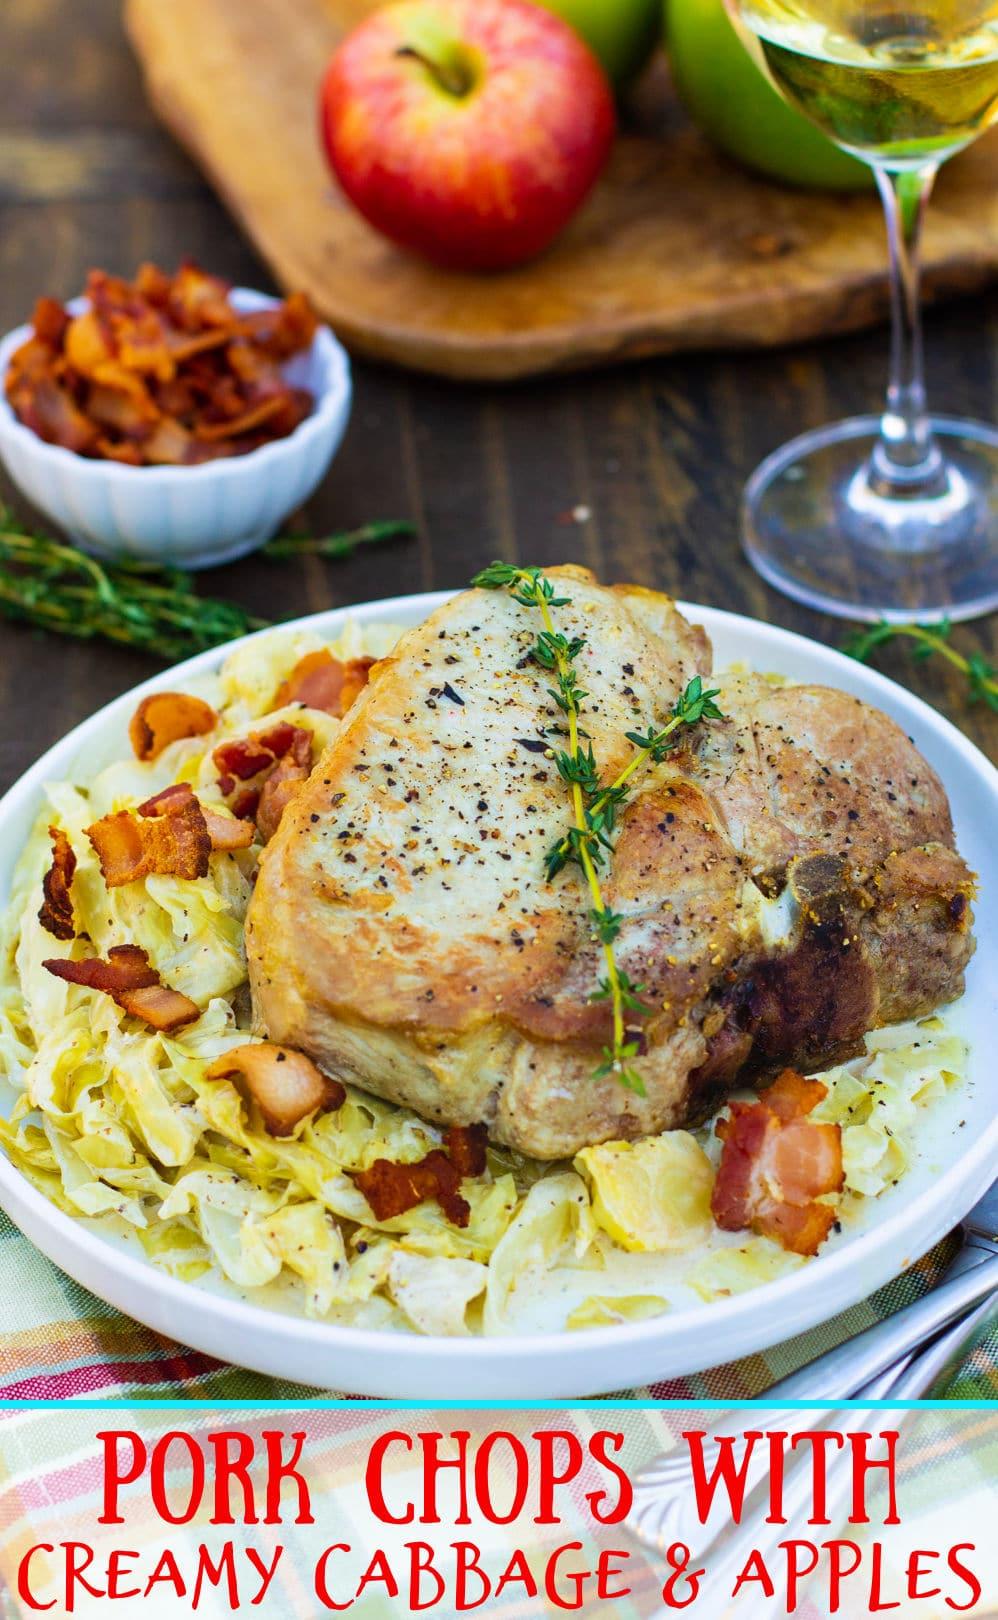 Pork Chop served over creamy cabbage.